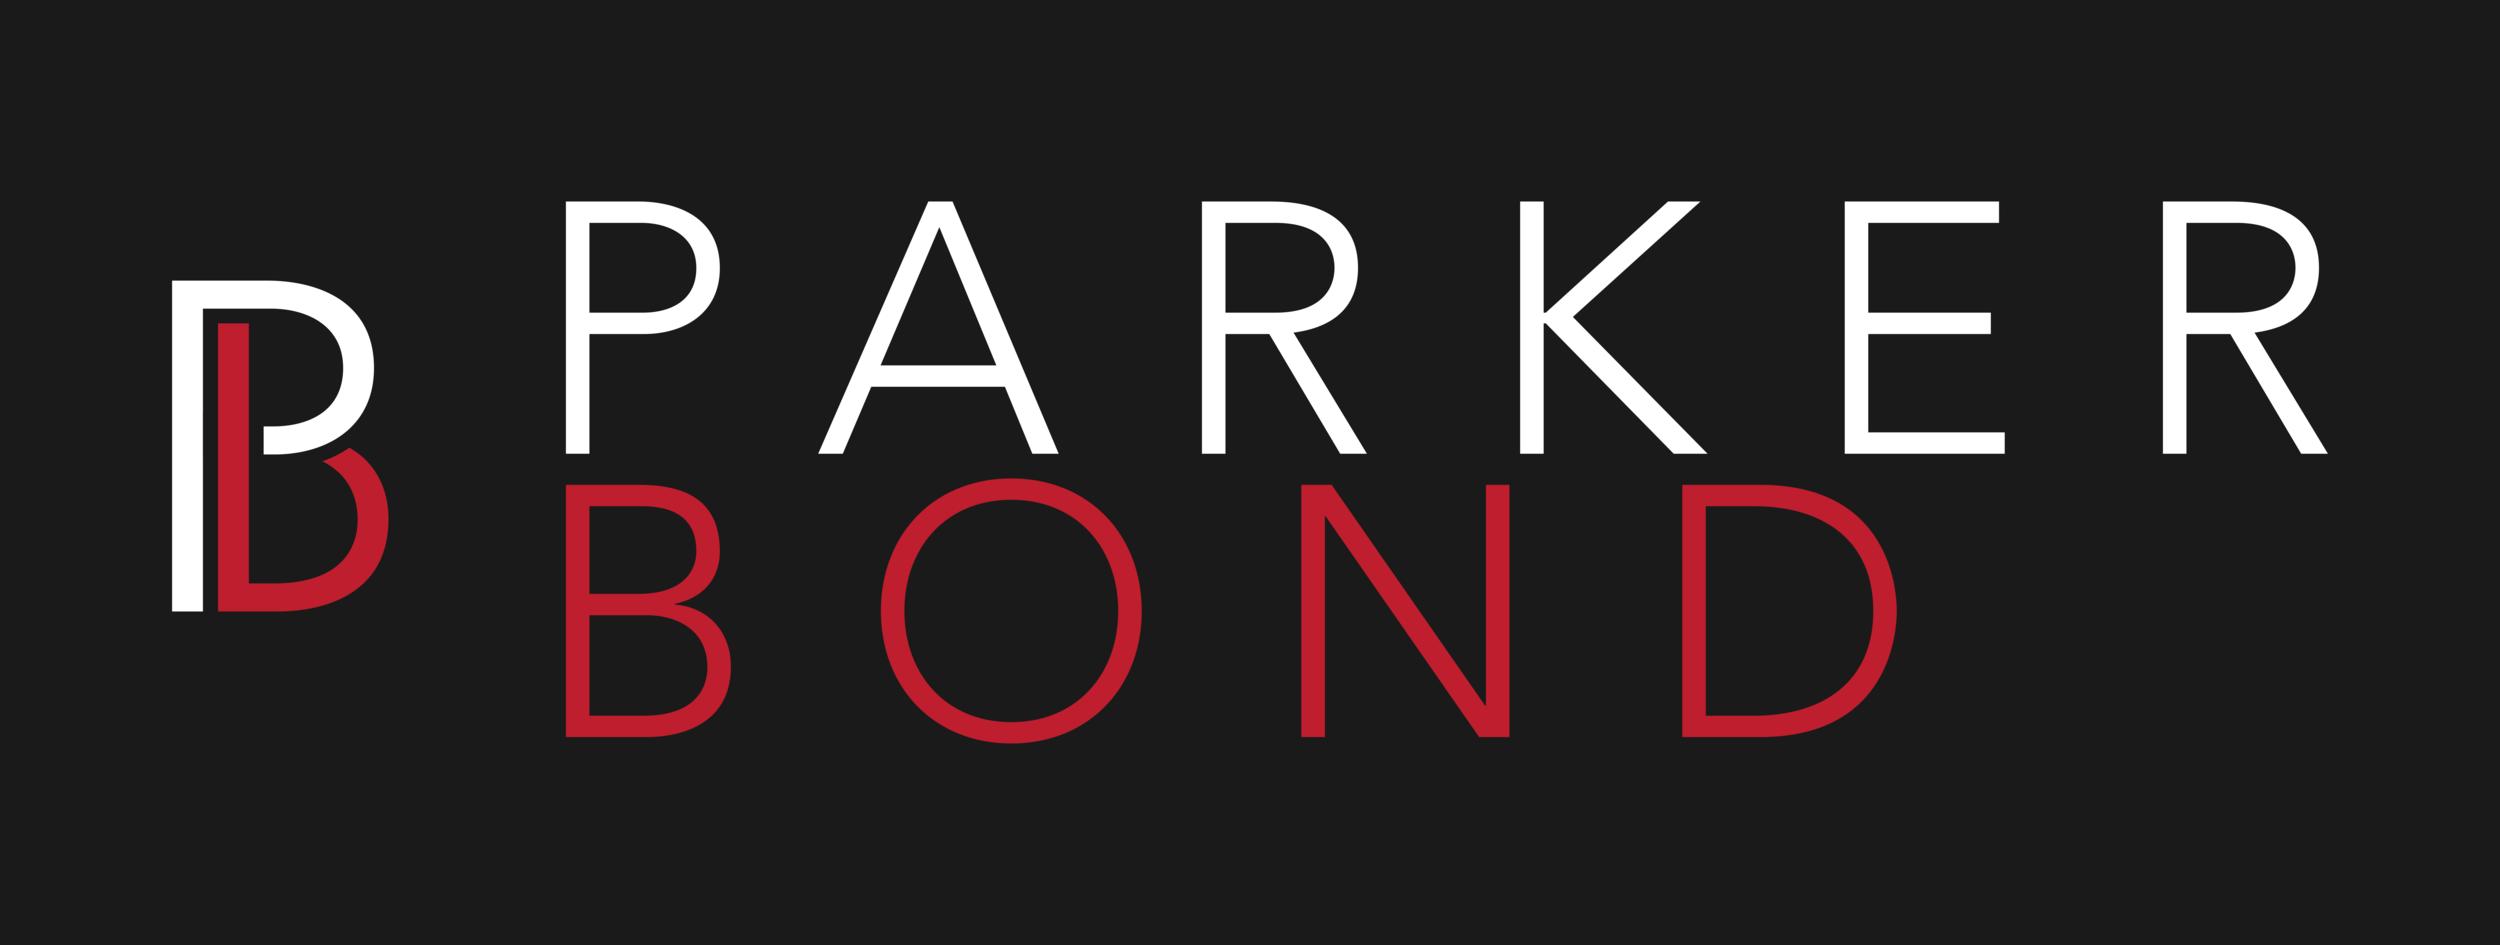 DARK ParkerBond (10000px).png